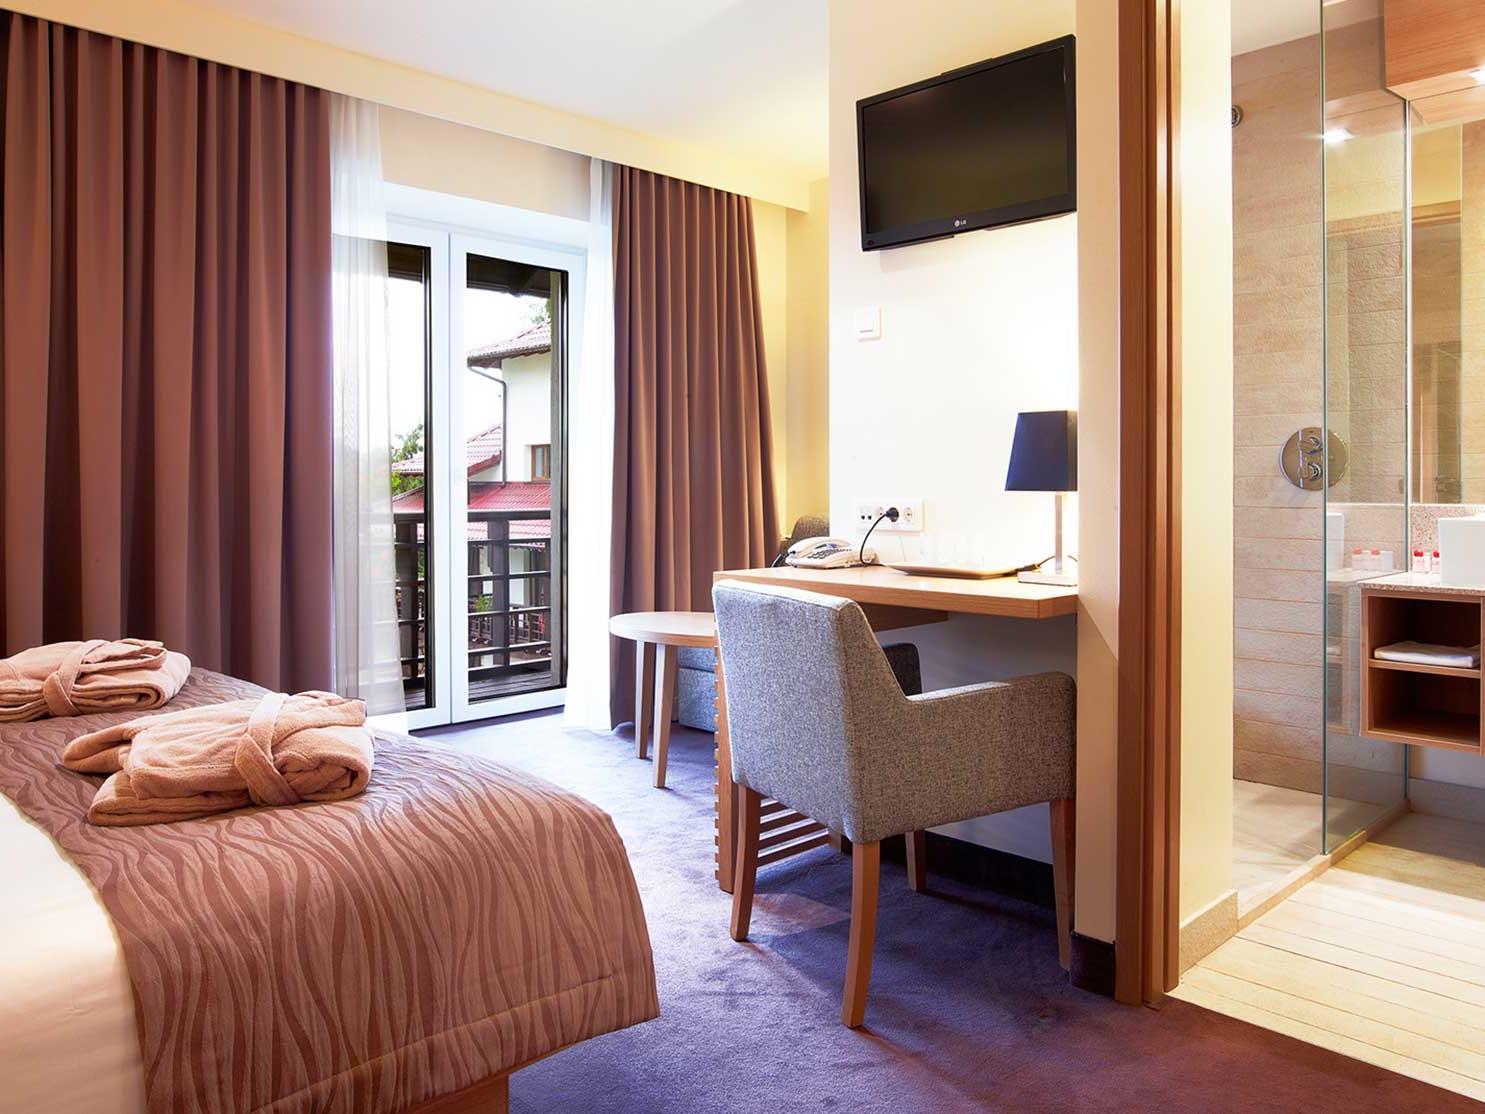 King Balcony Room la Ana Hotels Sport Poiana Brașov